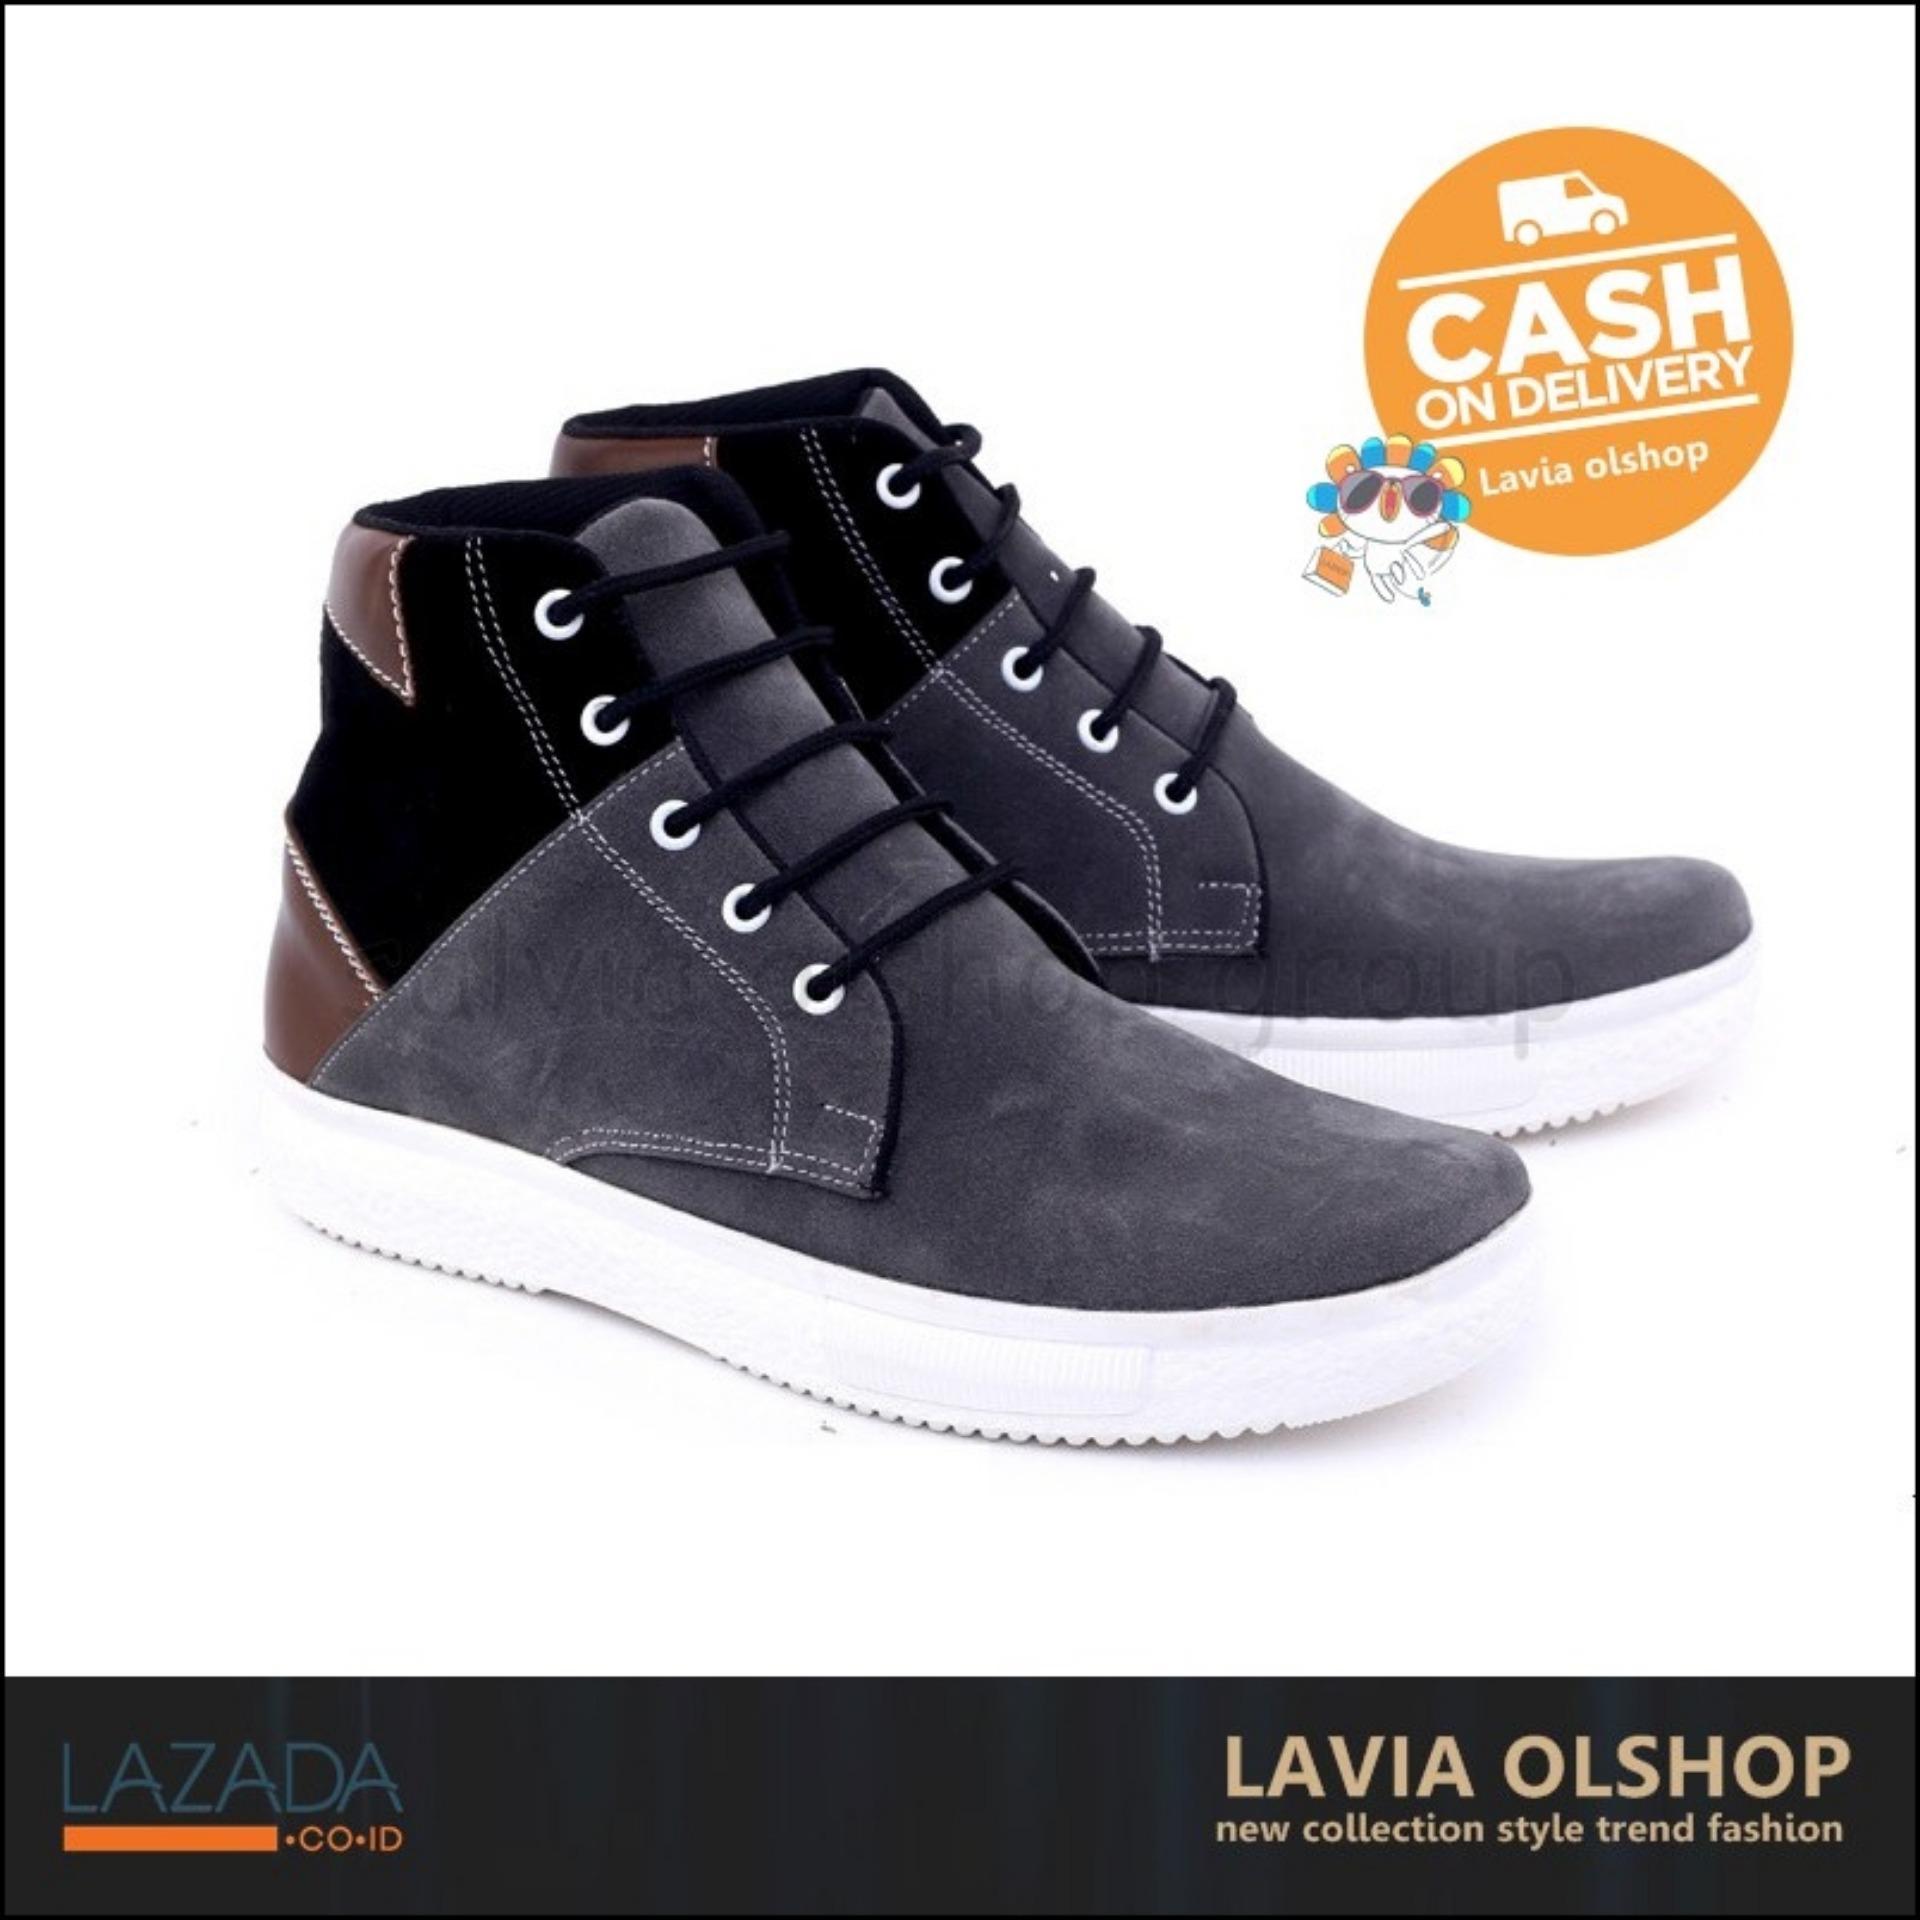 Buy Sell Cheapest Terbaru 2015 Modis Best Quality Product Deals Jaket Motor Tahan Angin Romero Shoes Sepatu Casual Boots Pria Keren Dan Model Gud Abu